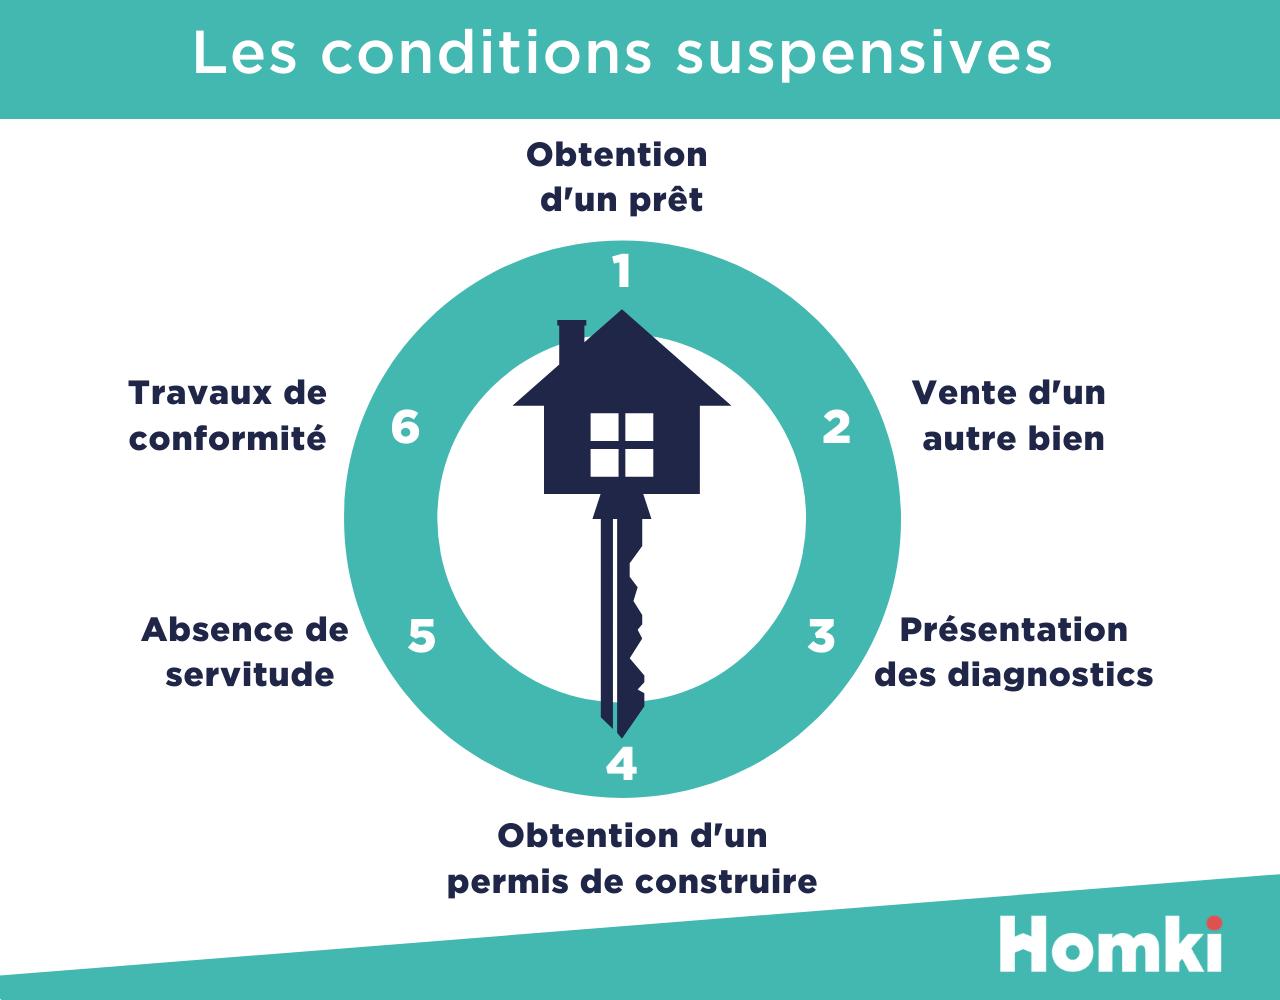 Homki - Les clauses suspensives